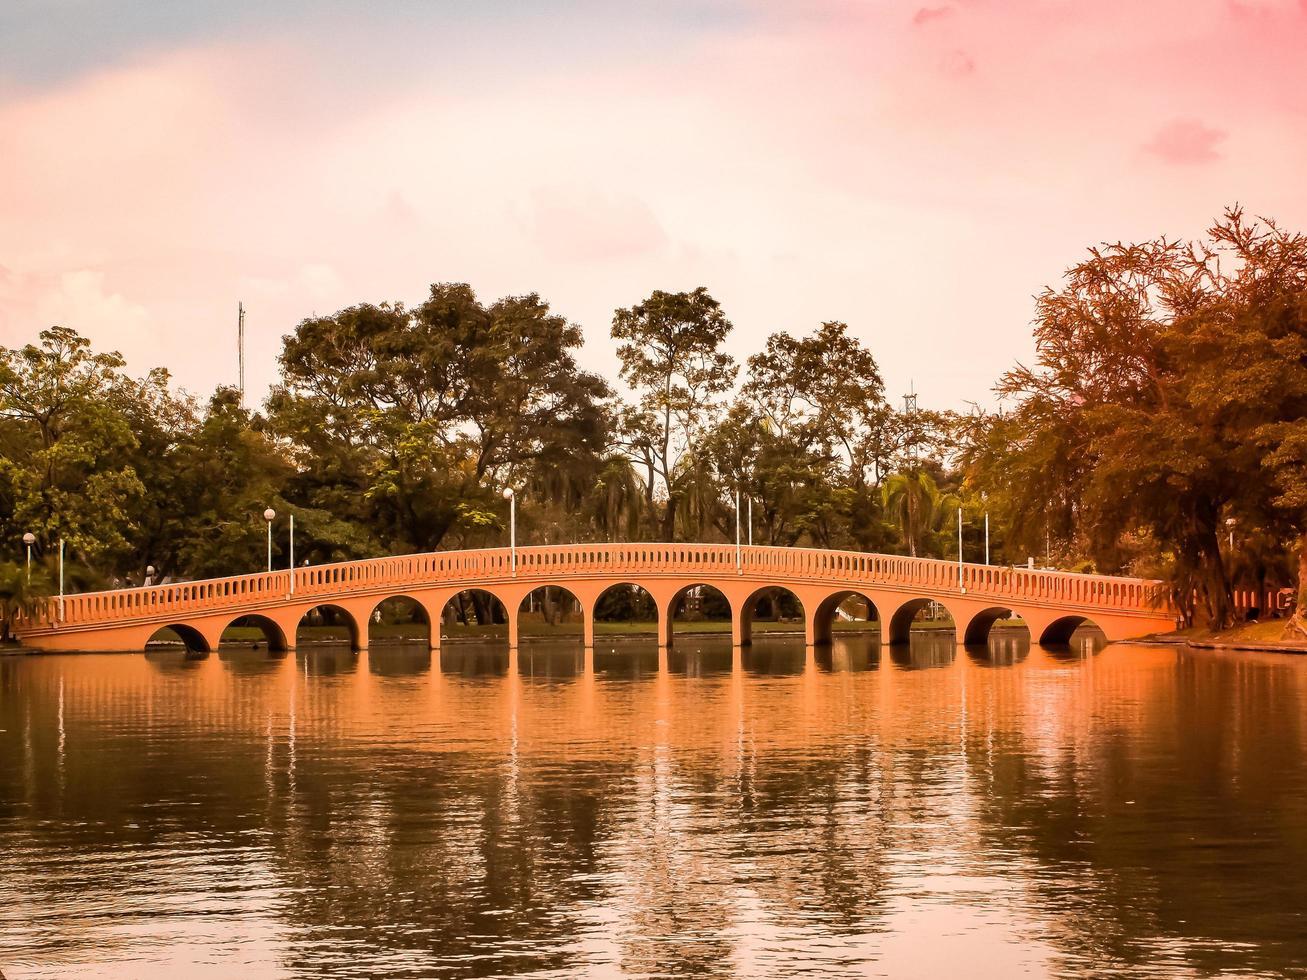 pont vintage rouge photo